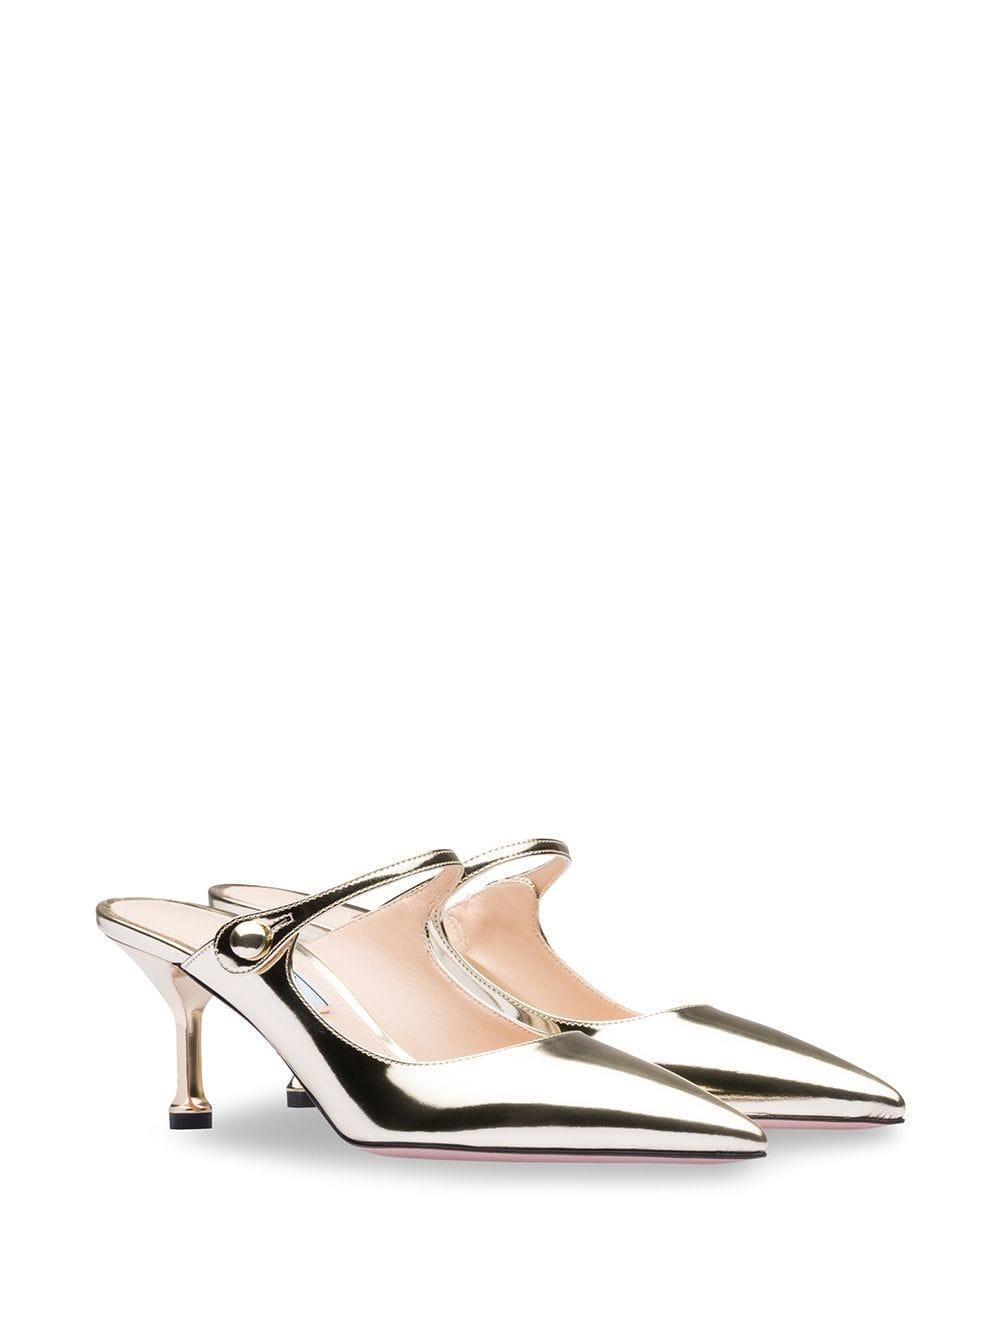 62b96500fb4 Prada Metallic Low-heel Pumps in Metallic - Lyst